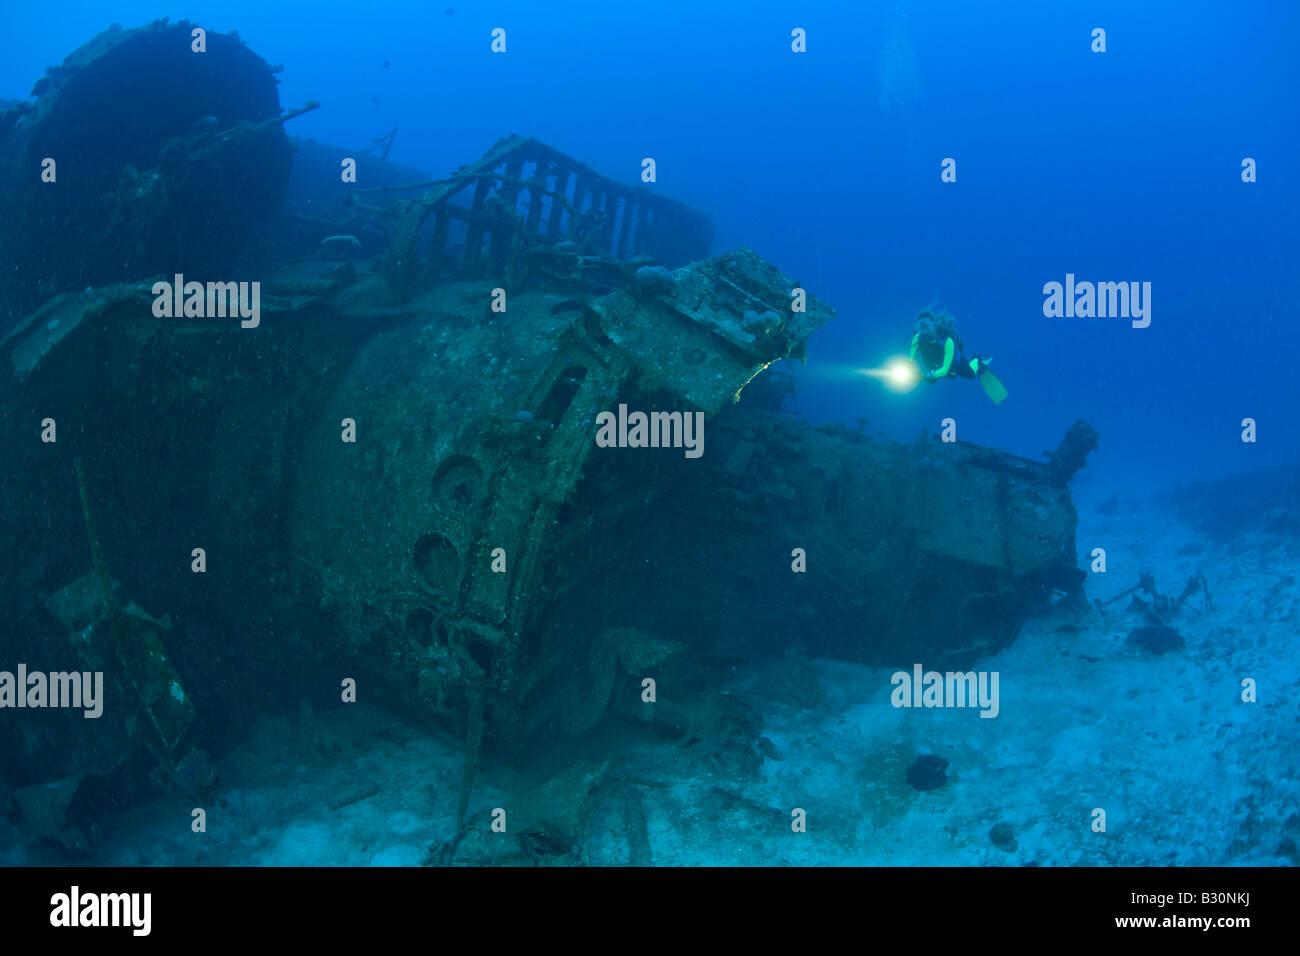 Diver at Bridge of Destroyer USS Anderson Marshall Islands Bikini Atoll Micronesia Pacific Ocean - Stock Image